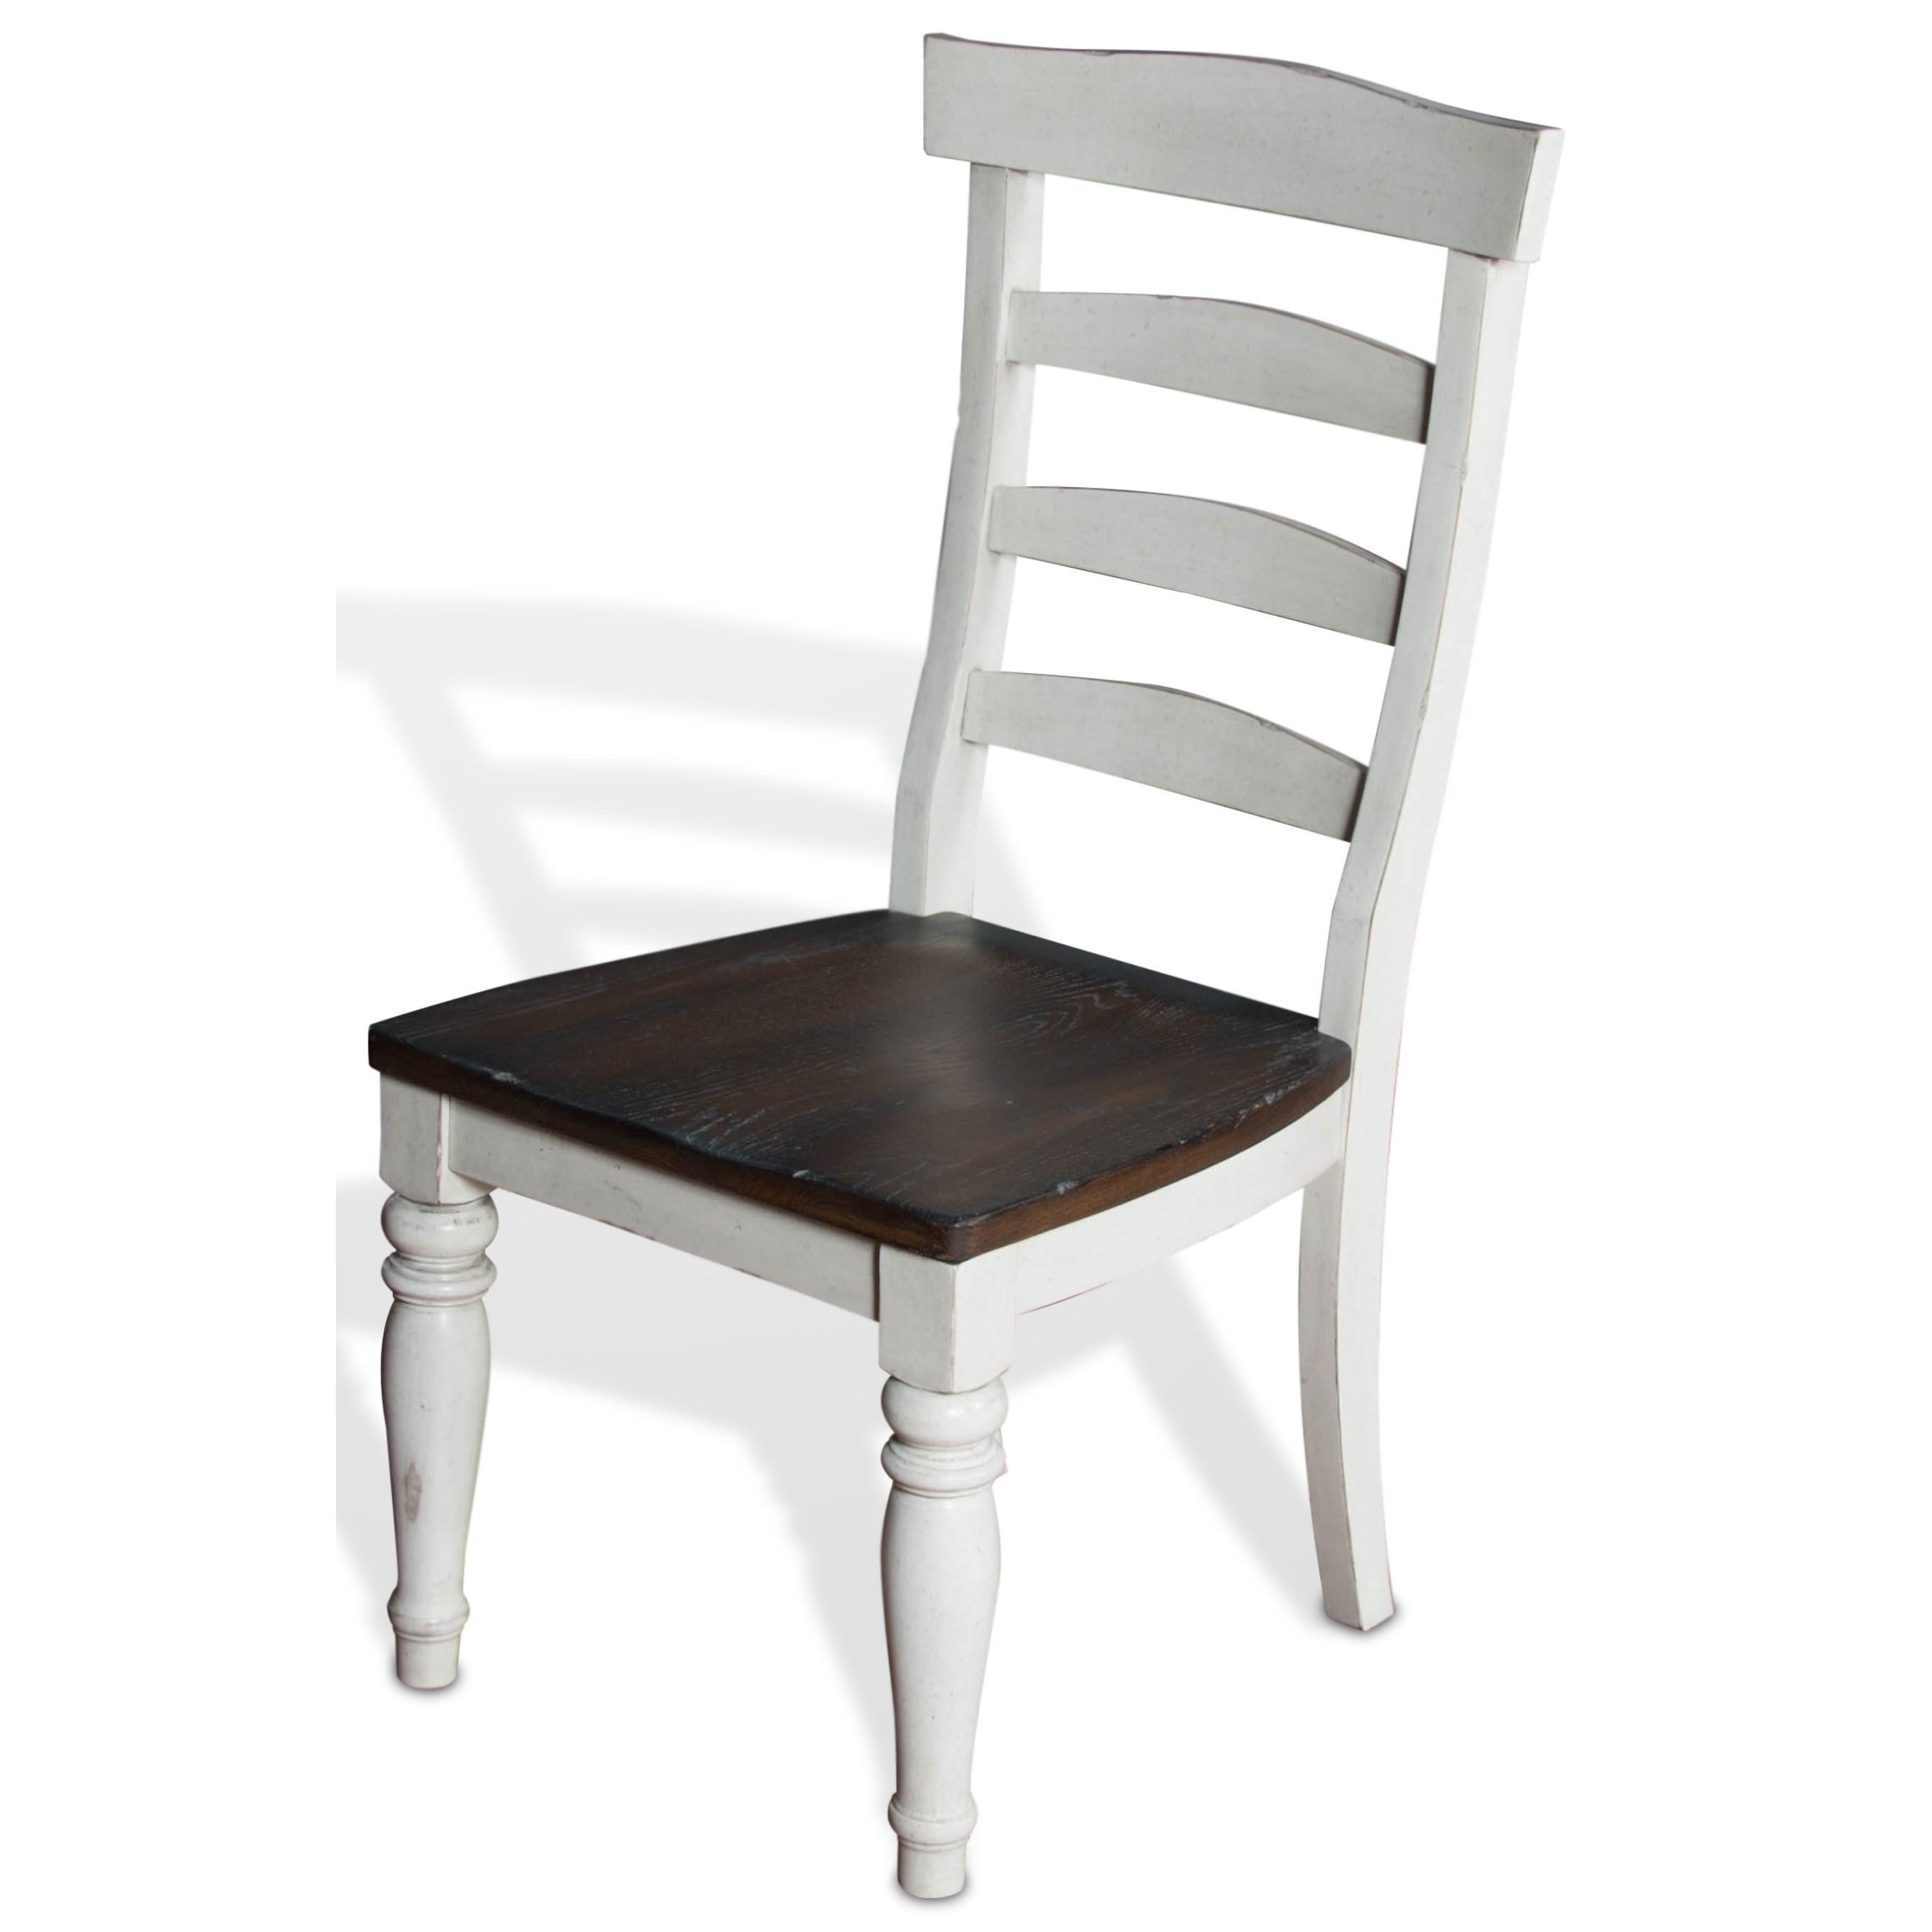 Two Tone Ladderback Chair W/ Wood Seat